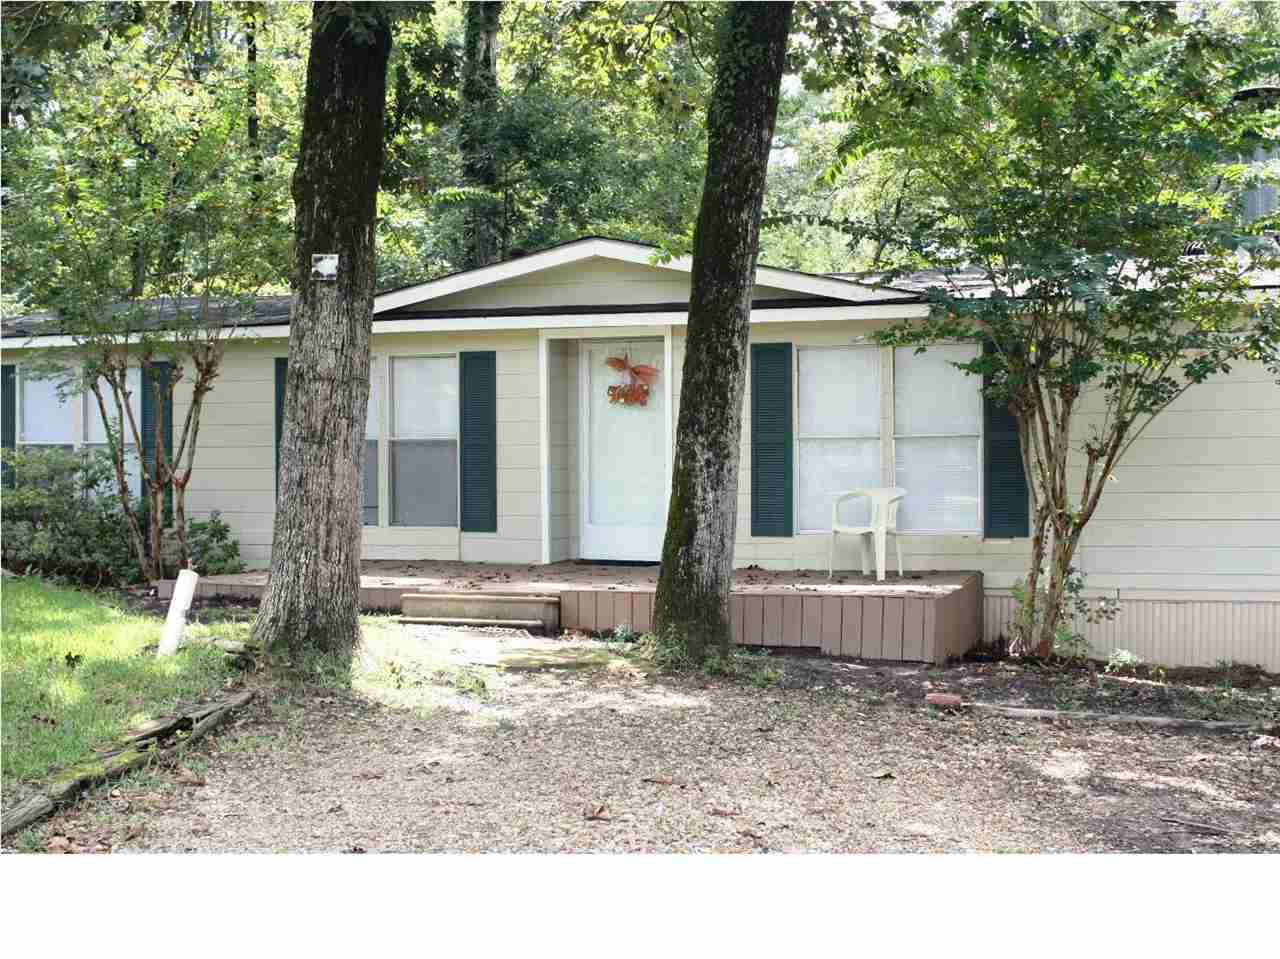 Rental Homes for Rent, ListingId:36568910, location: 217 EL DORADO CIR Pearl 39208